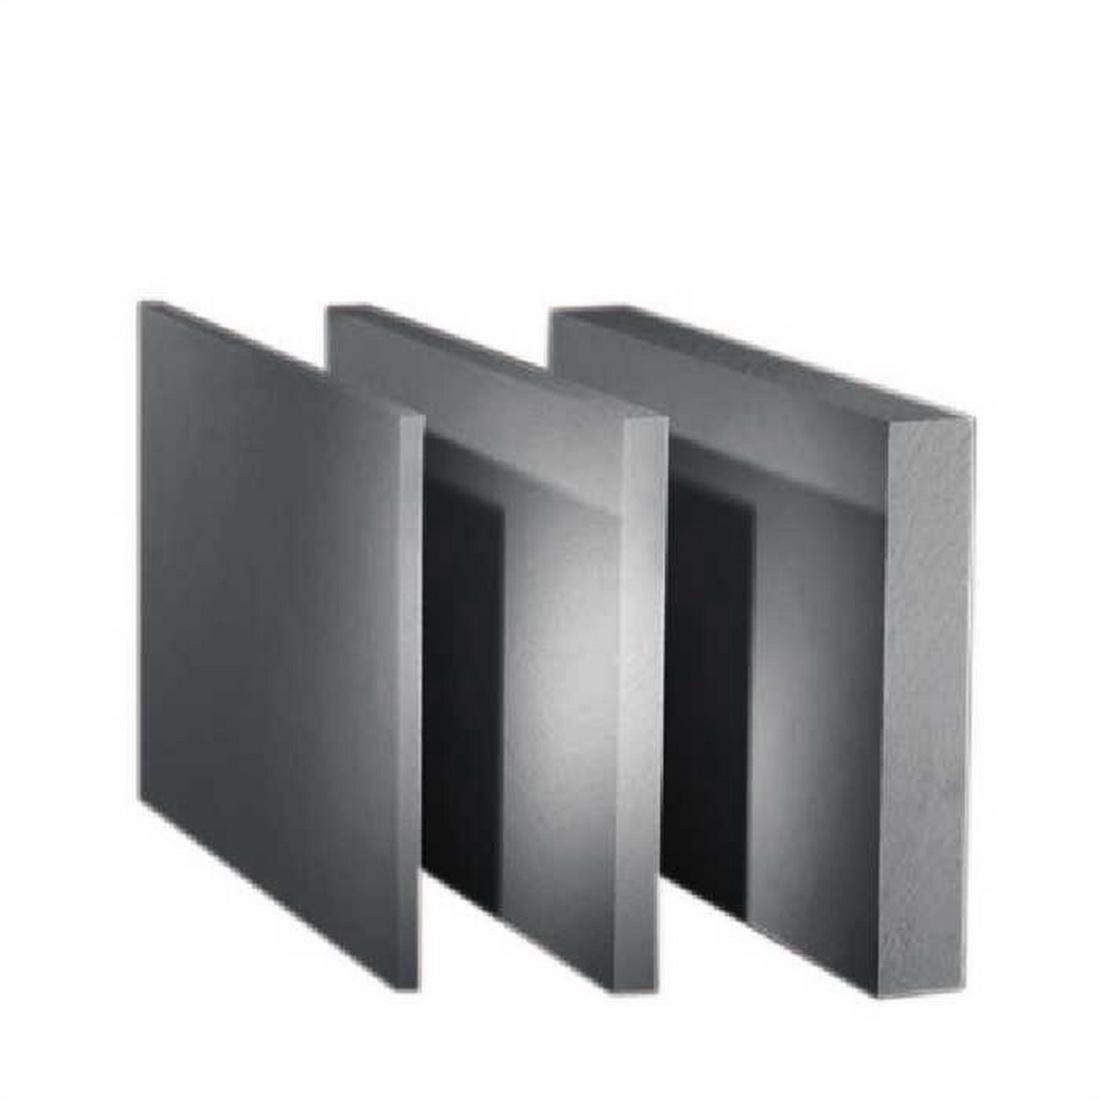 Expol Platinum Board 2400 x 1200 x 35mm R1.09 Black Expanded Polystyrene N2435